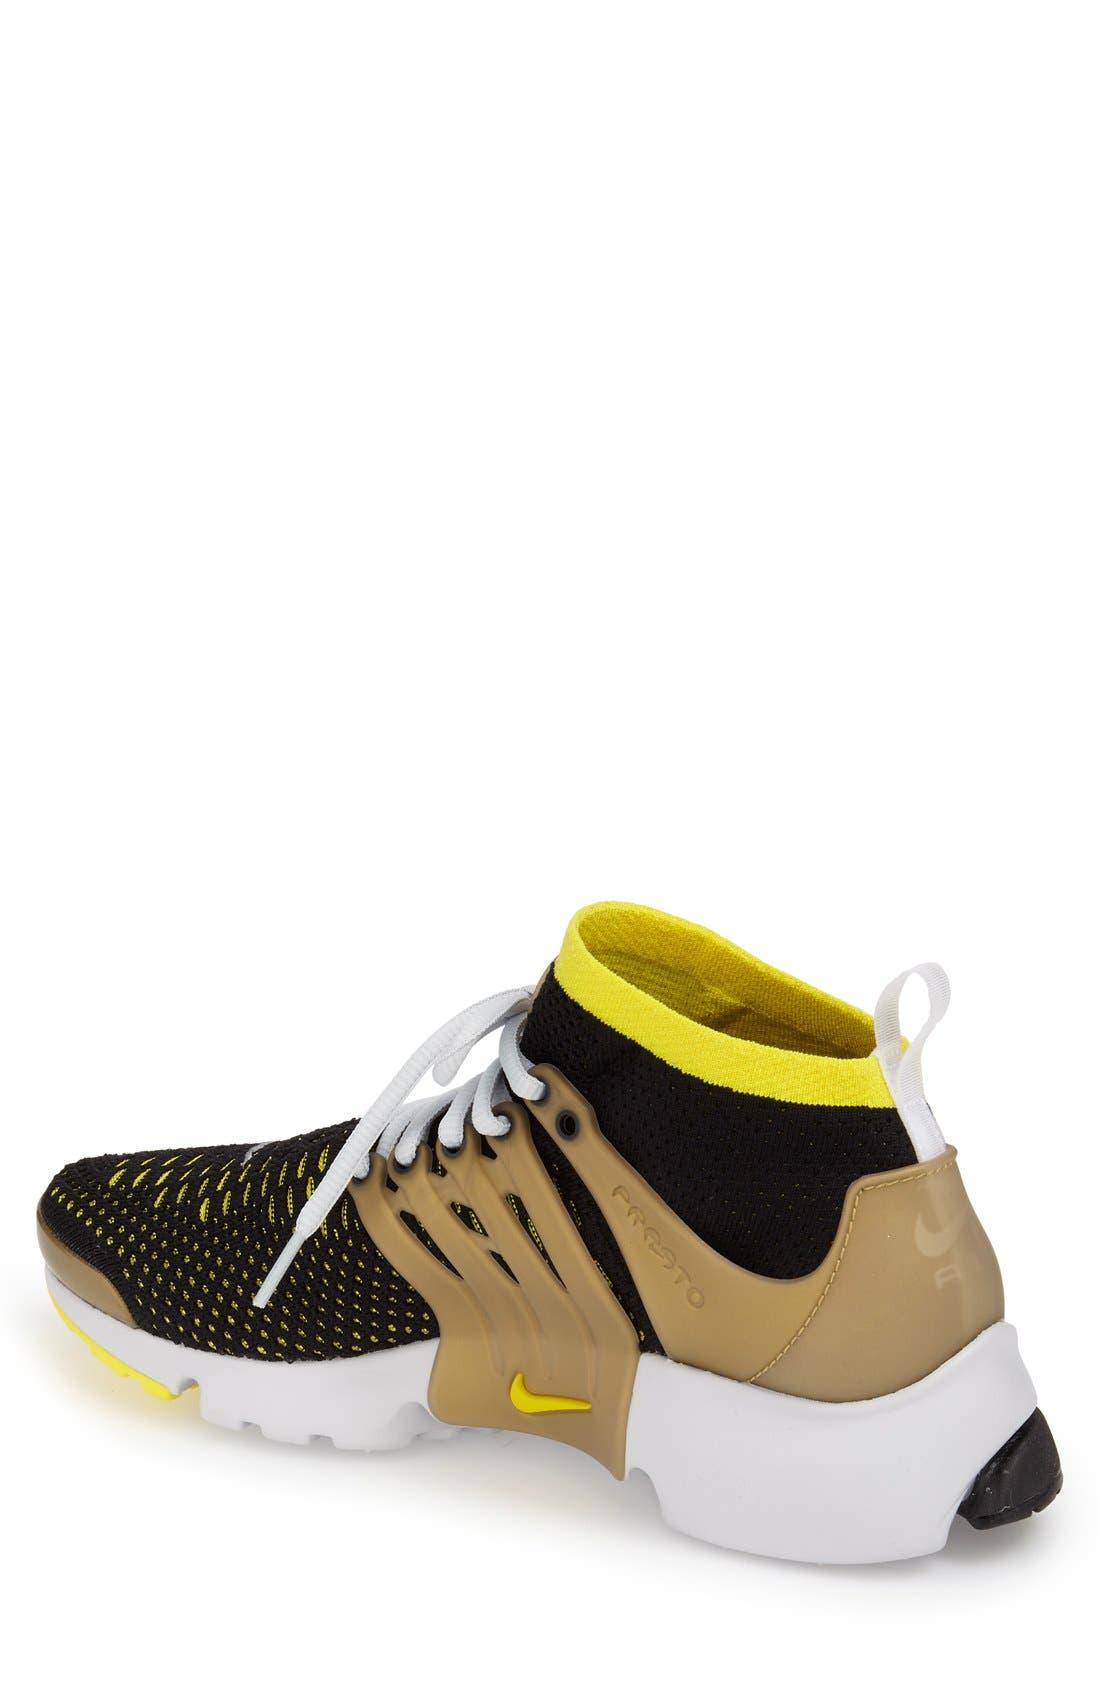 'Air Presto Flyknit Ultra' Sneaker,                             Alternate thumbnail 2, color,                             007